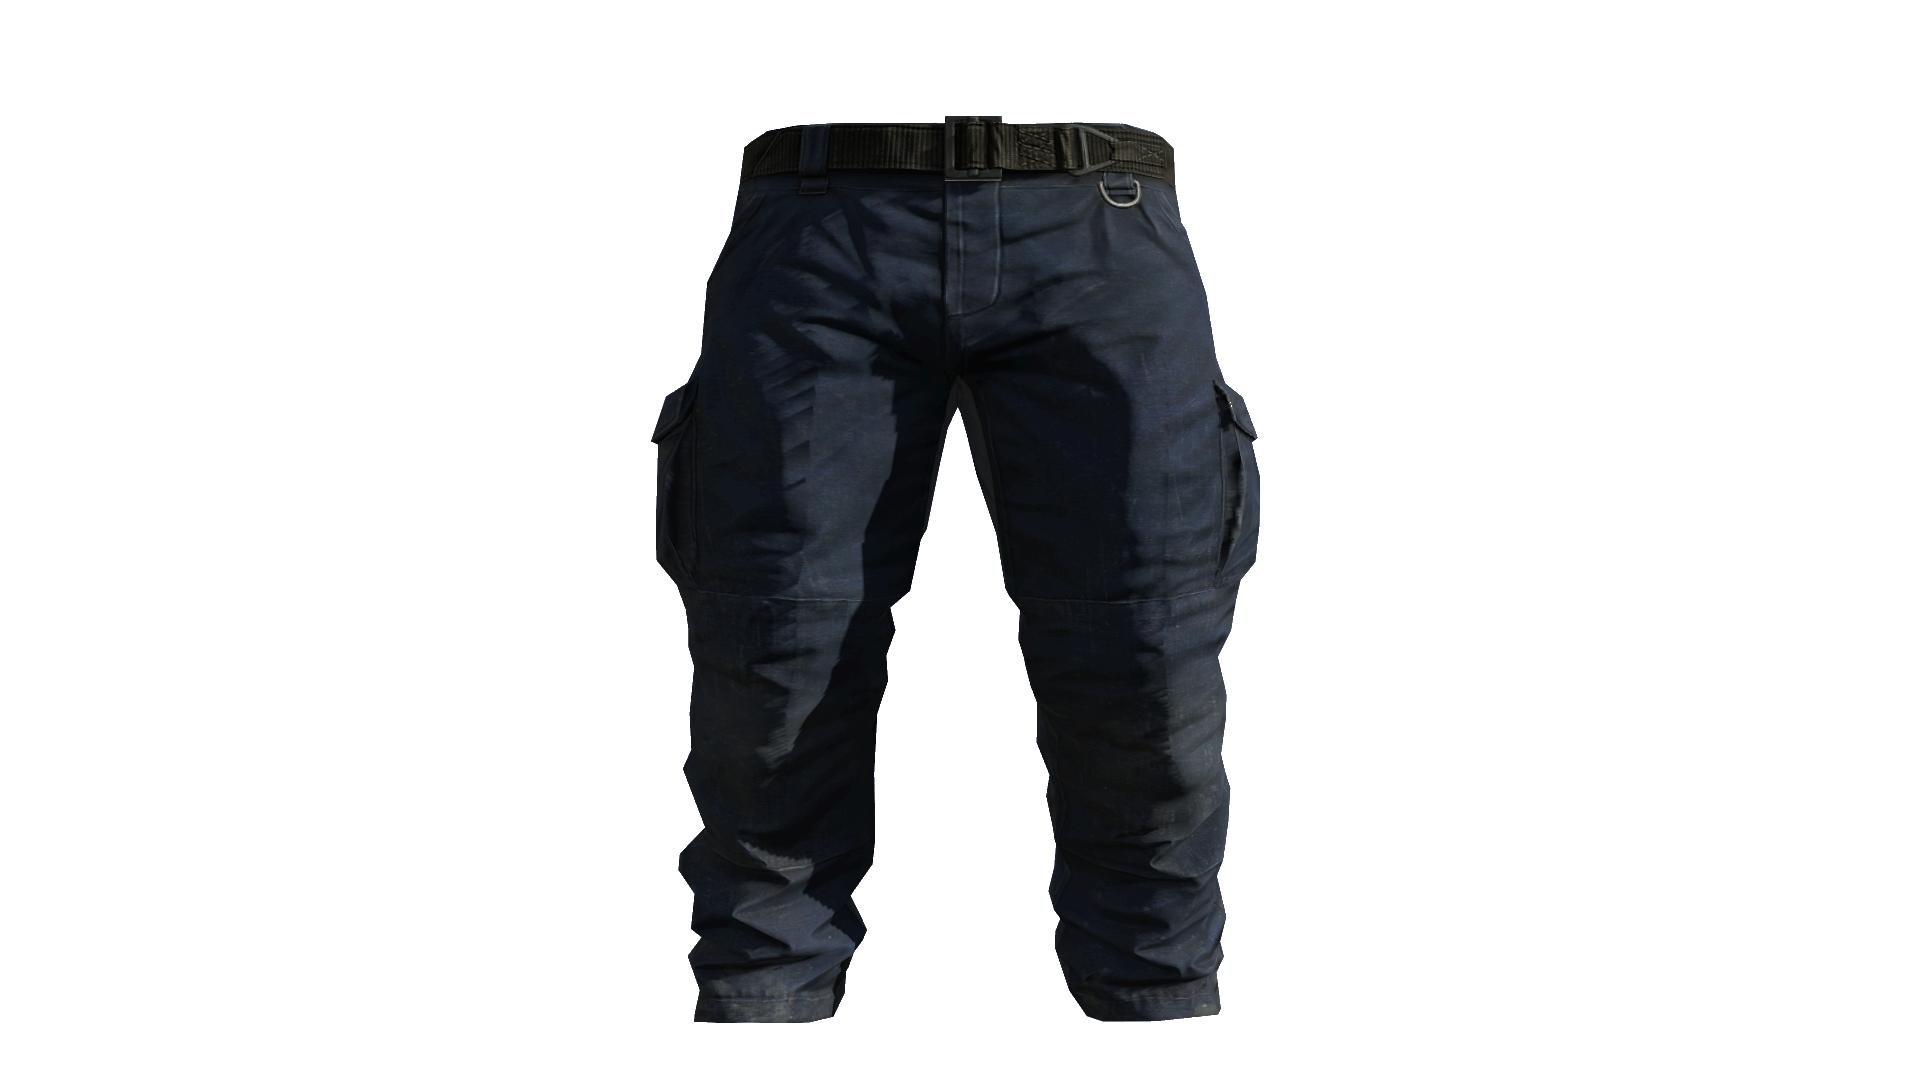 Blue Cargo Pants Model (P W).png - Pants, Transparent background PNG HD thumbnail